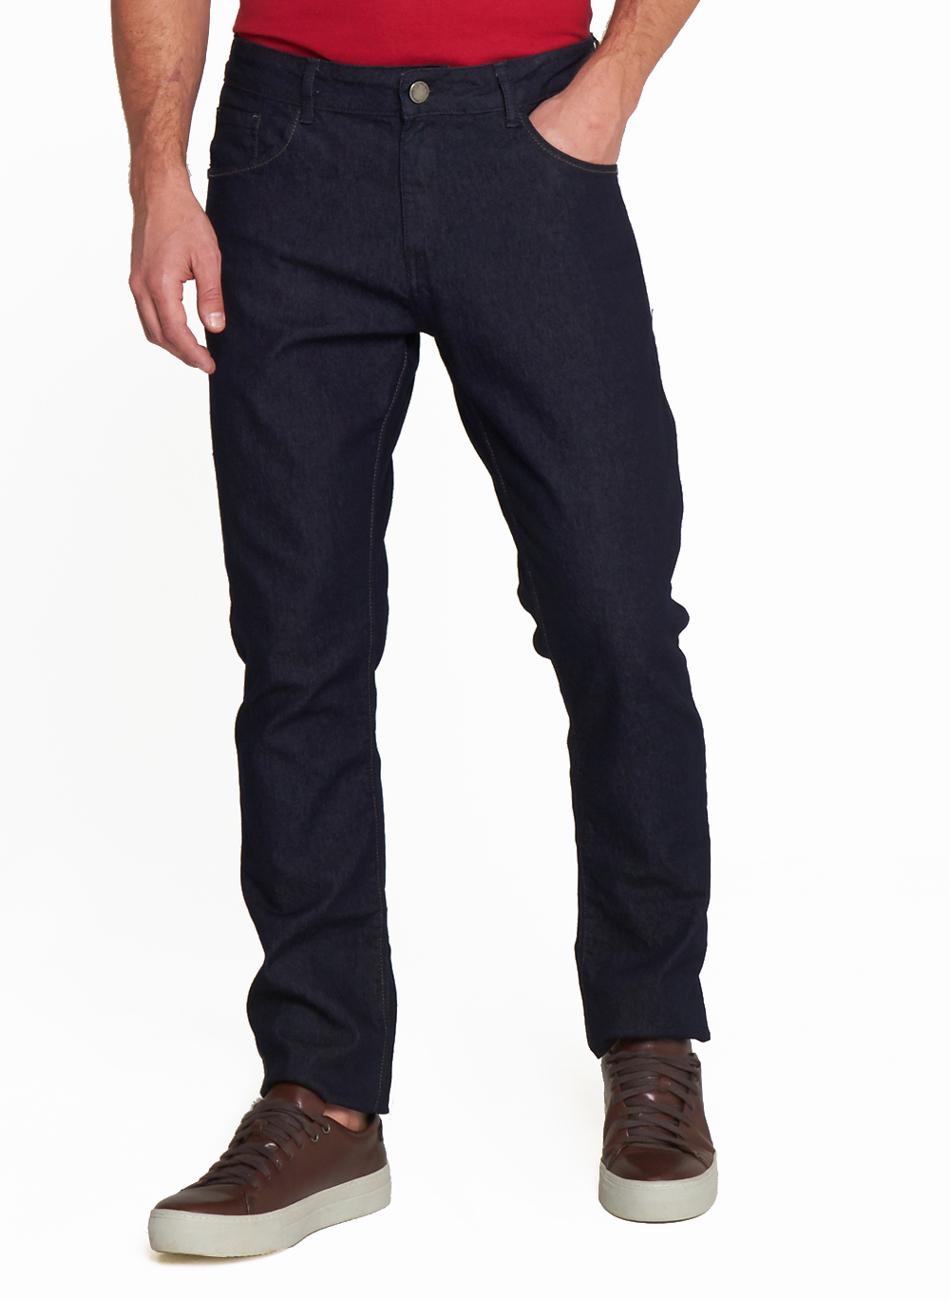 Calça Jeans Masculina Slim Five Pockets Individual